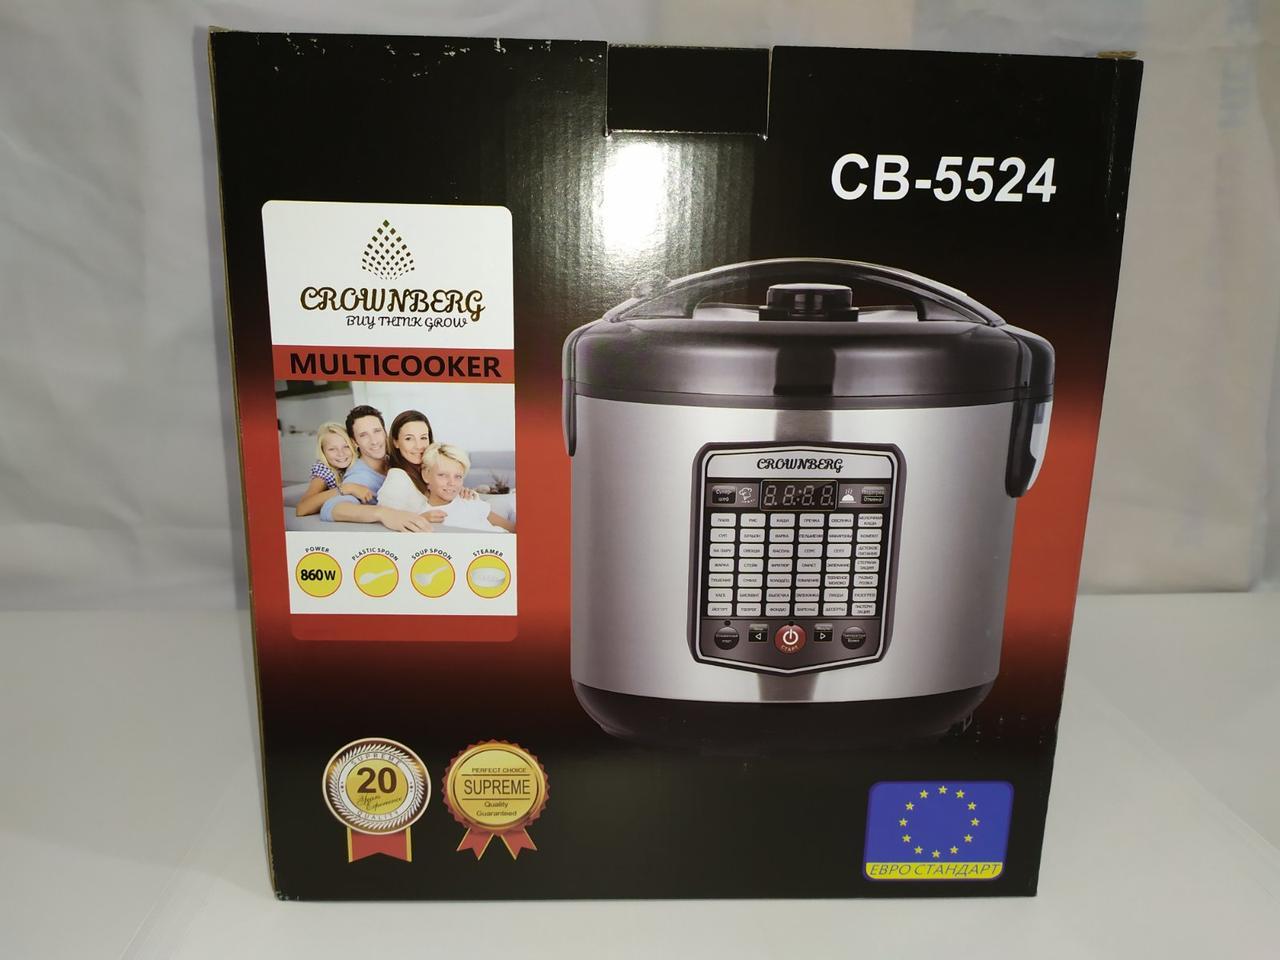 Мультиварка Crownberg - CB-5524